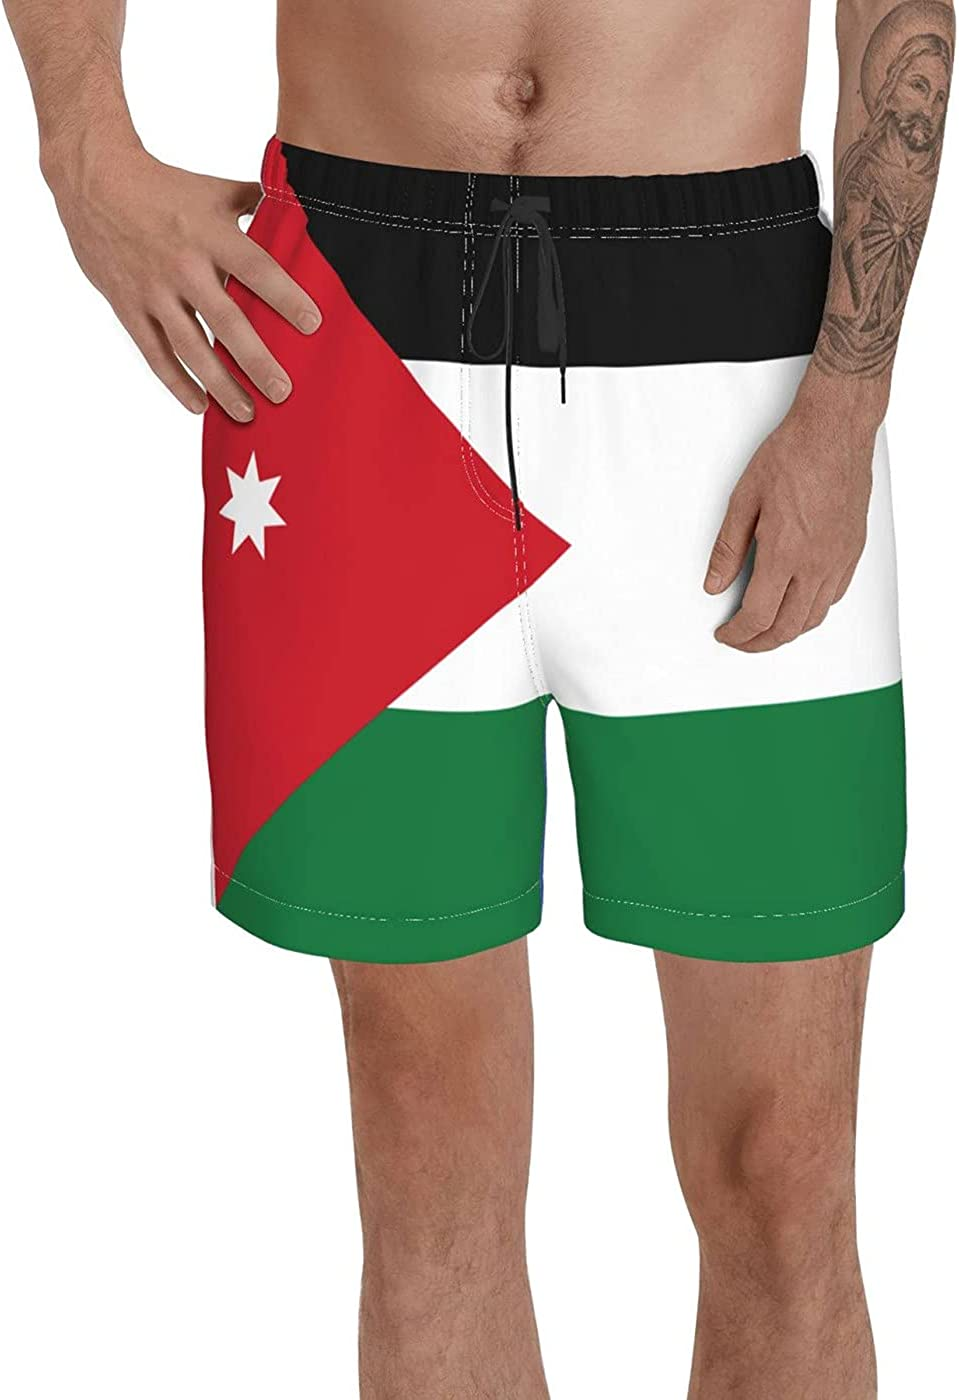 Jordan Flag Men's 3D Printed Funny Summer Quick Dry Swim Short Board Shorts with